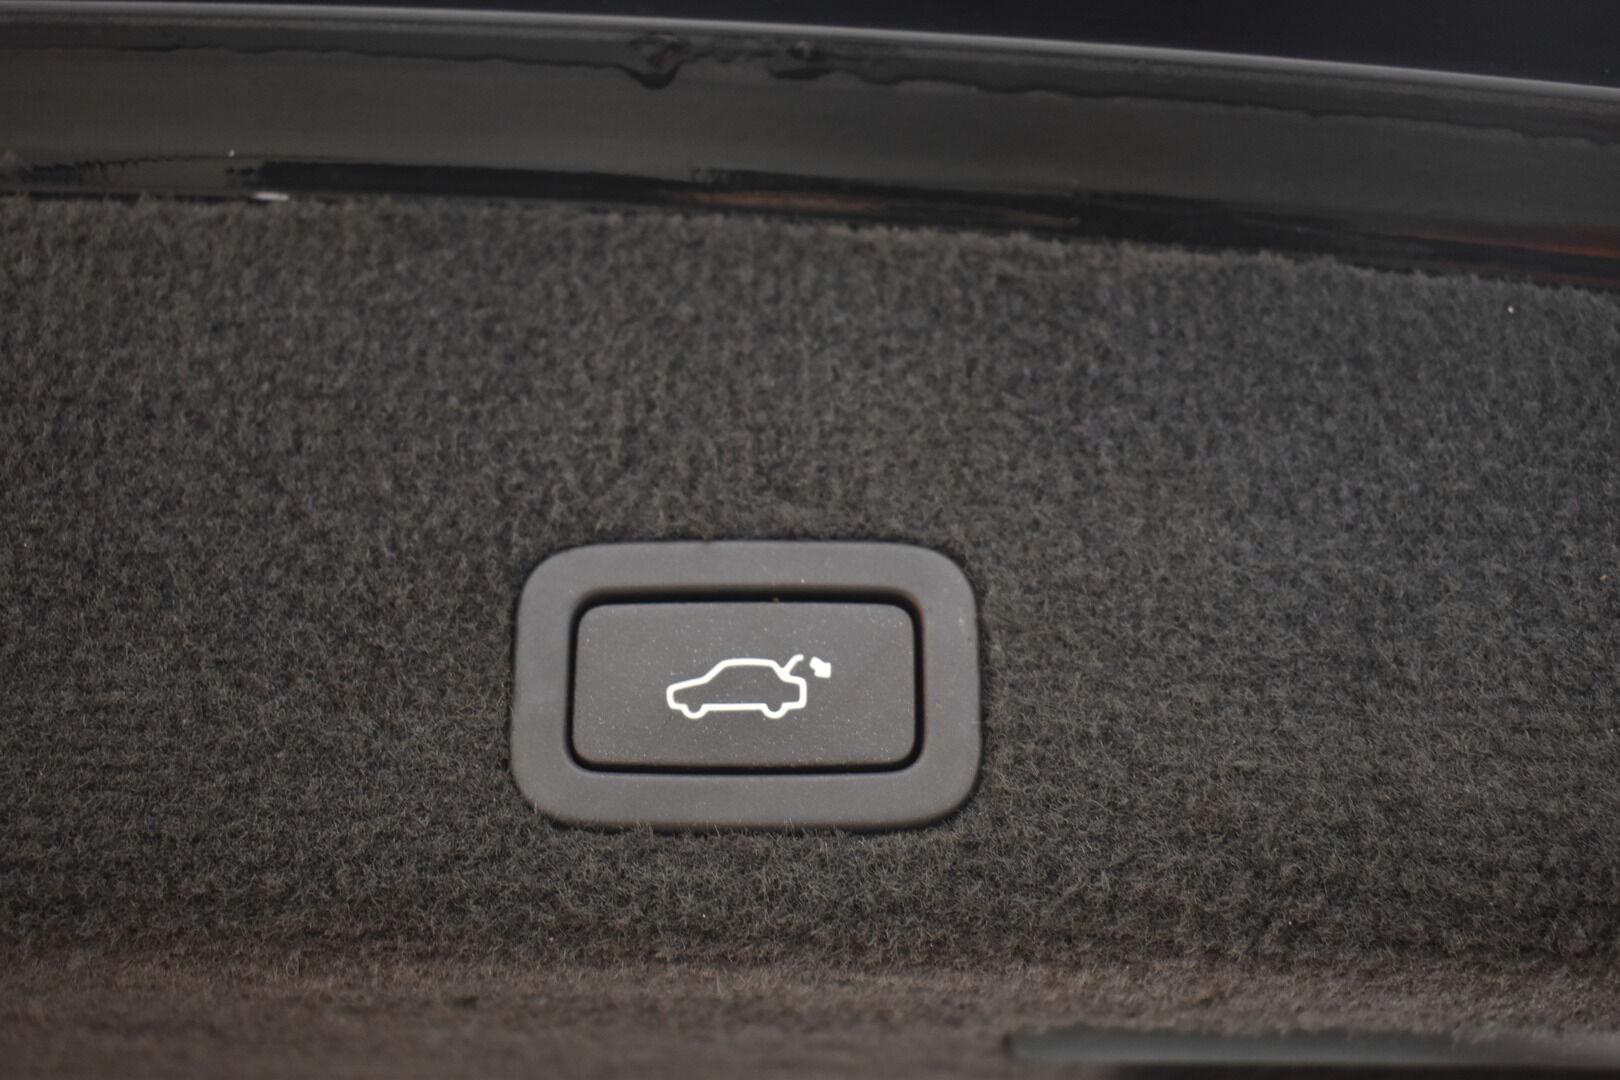 Musta Maastoauto, Volvo XC60 – BVZ-189, kuva 23